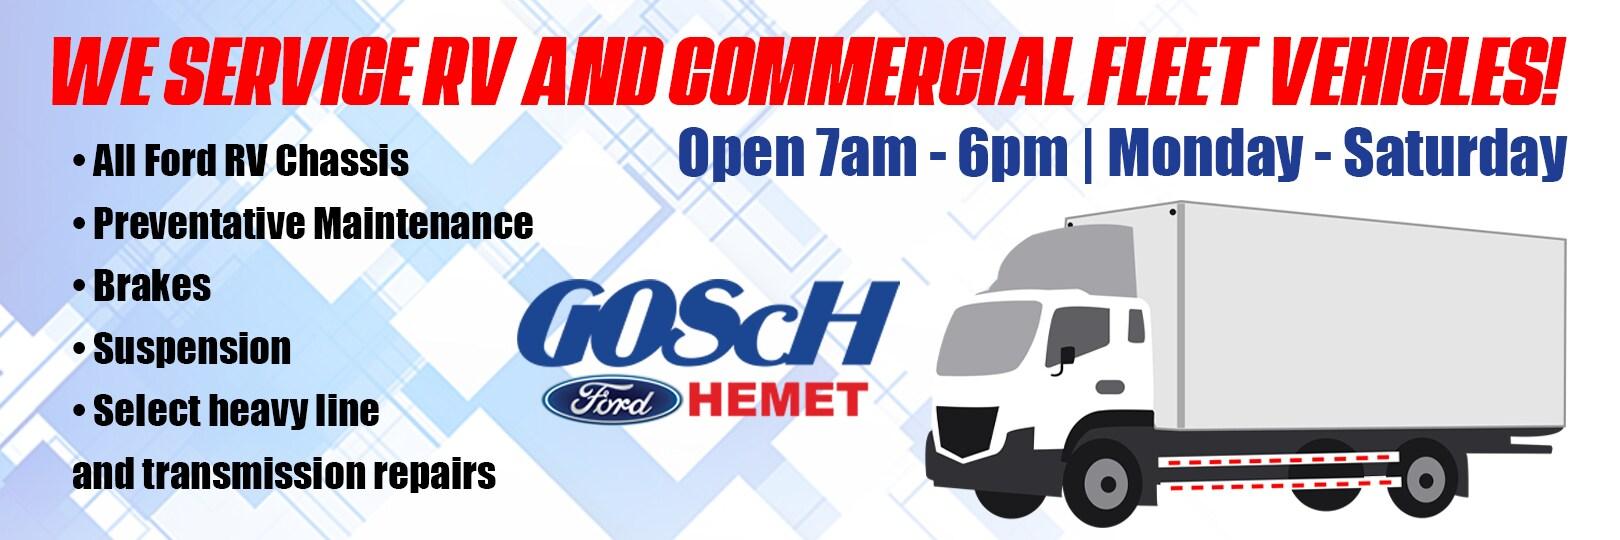 Gosch ford Hemet rv commercial fleet vehicle banner